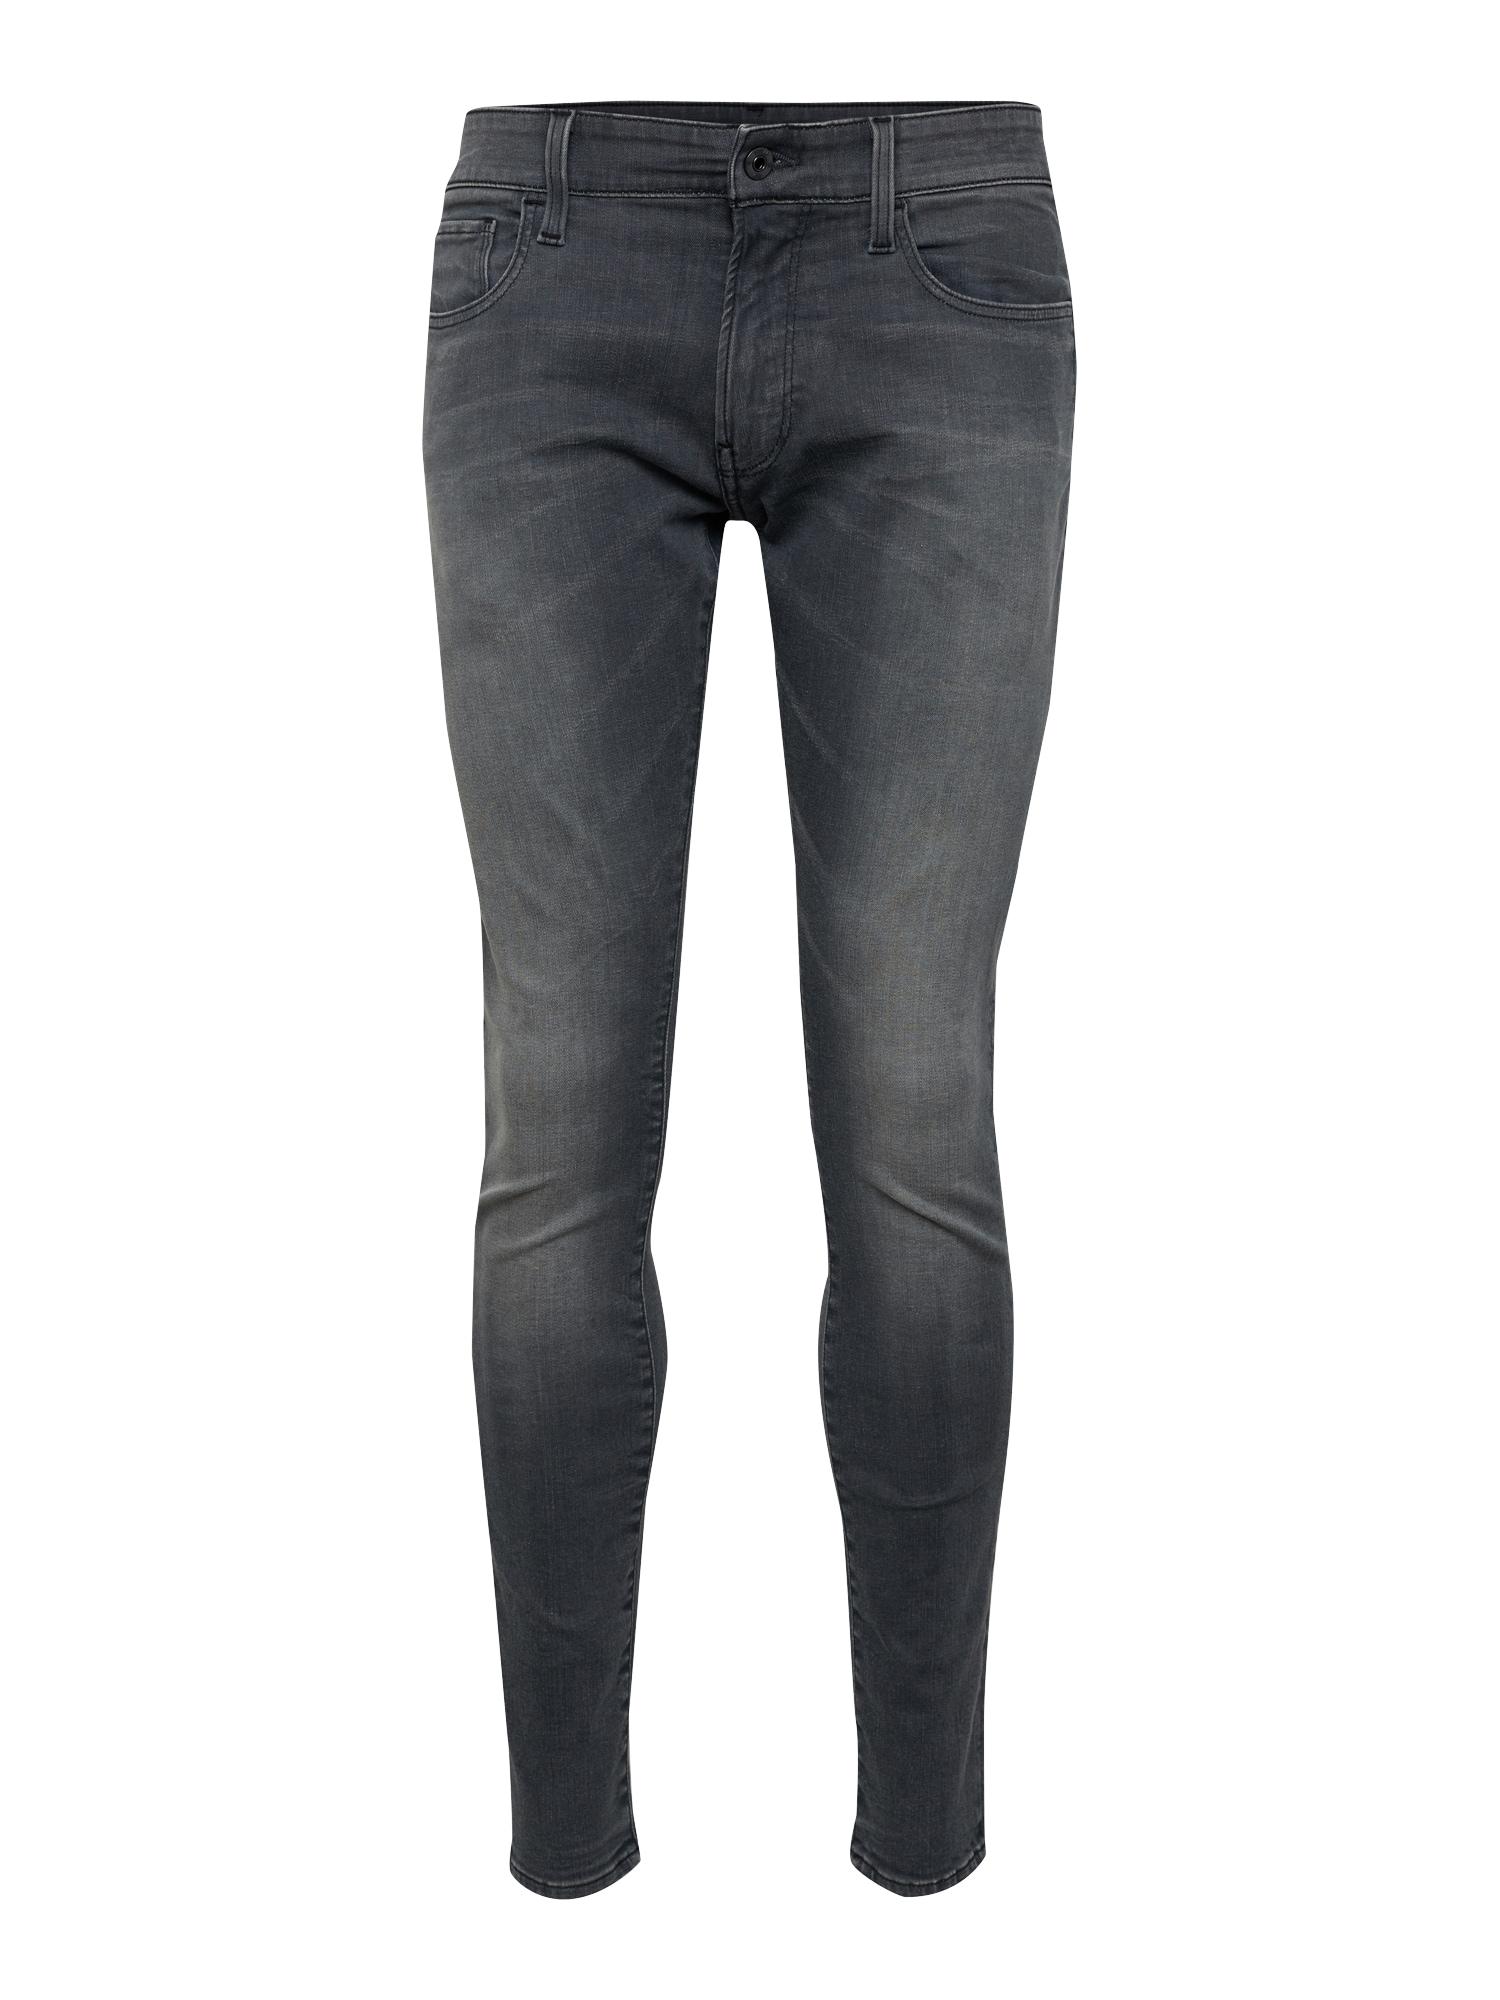 G-STAR RAW Heren Jeans 3301 Deconstructed Skinny grey denim